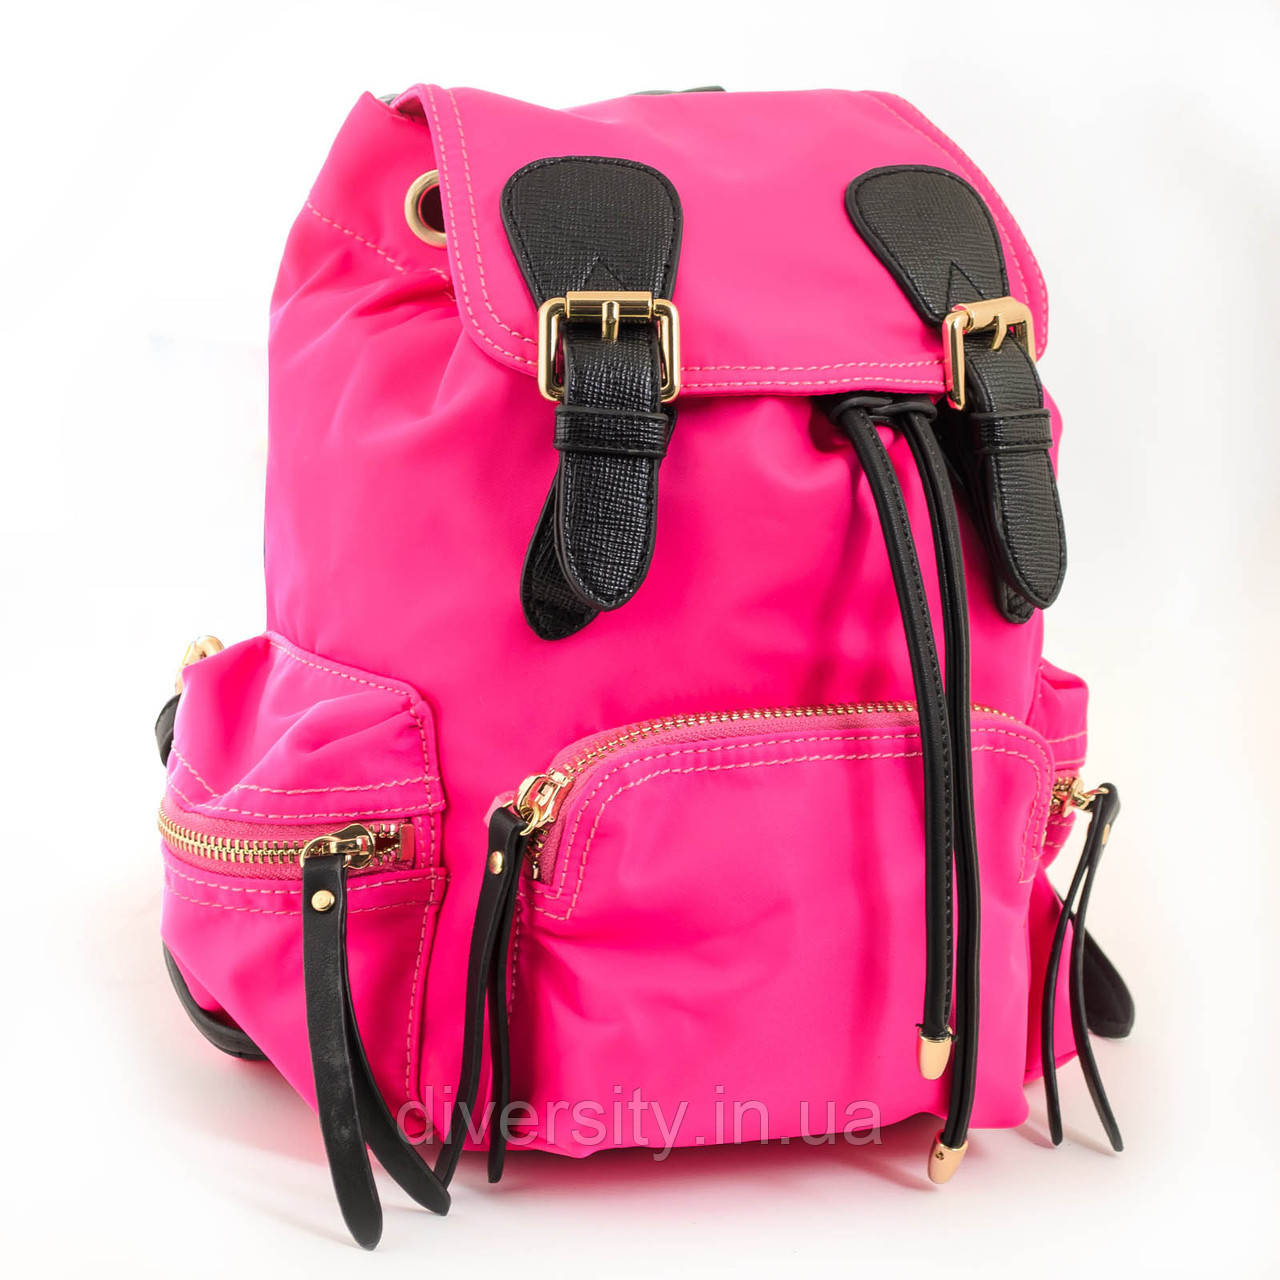 Сумка-рюкзак YES, ярко-розовый